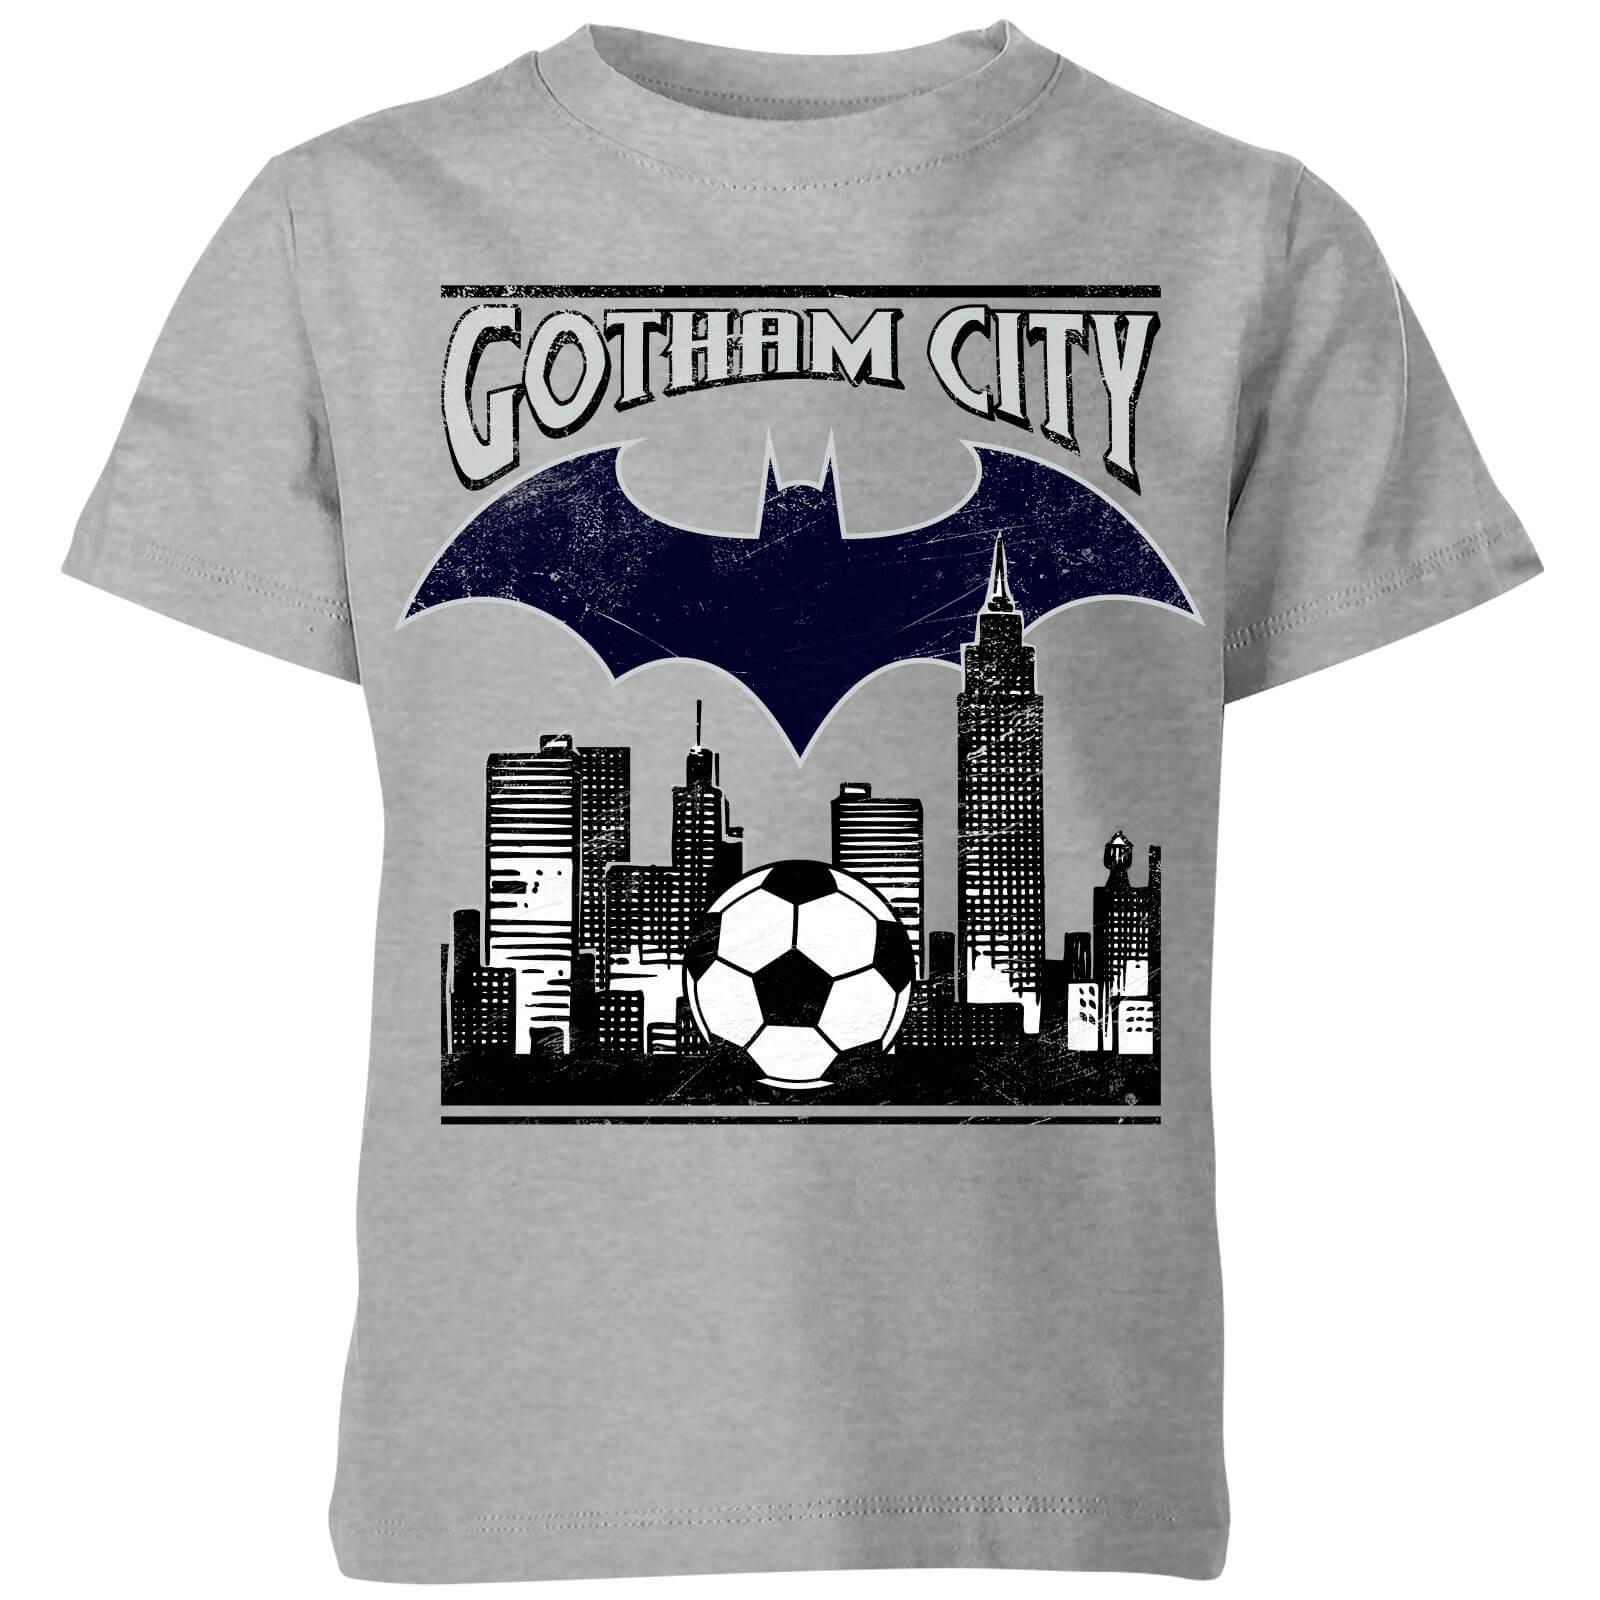 OfferteWeb.click 72-dc-batman-football-gotham-city-kids-t-shirt-grey-9-10